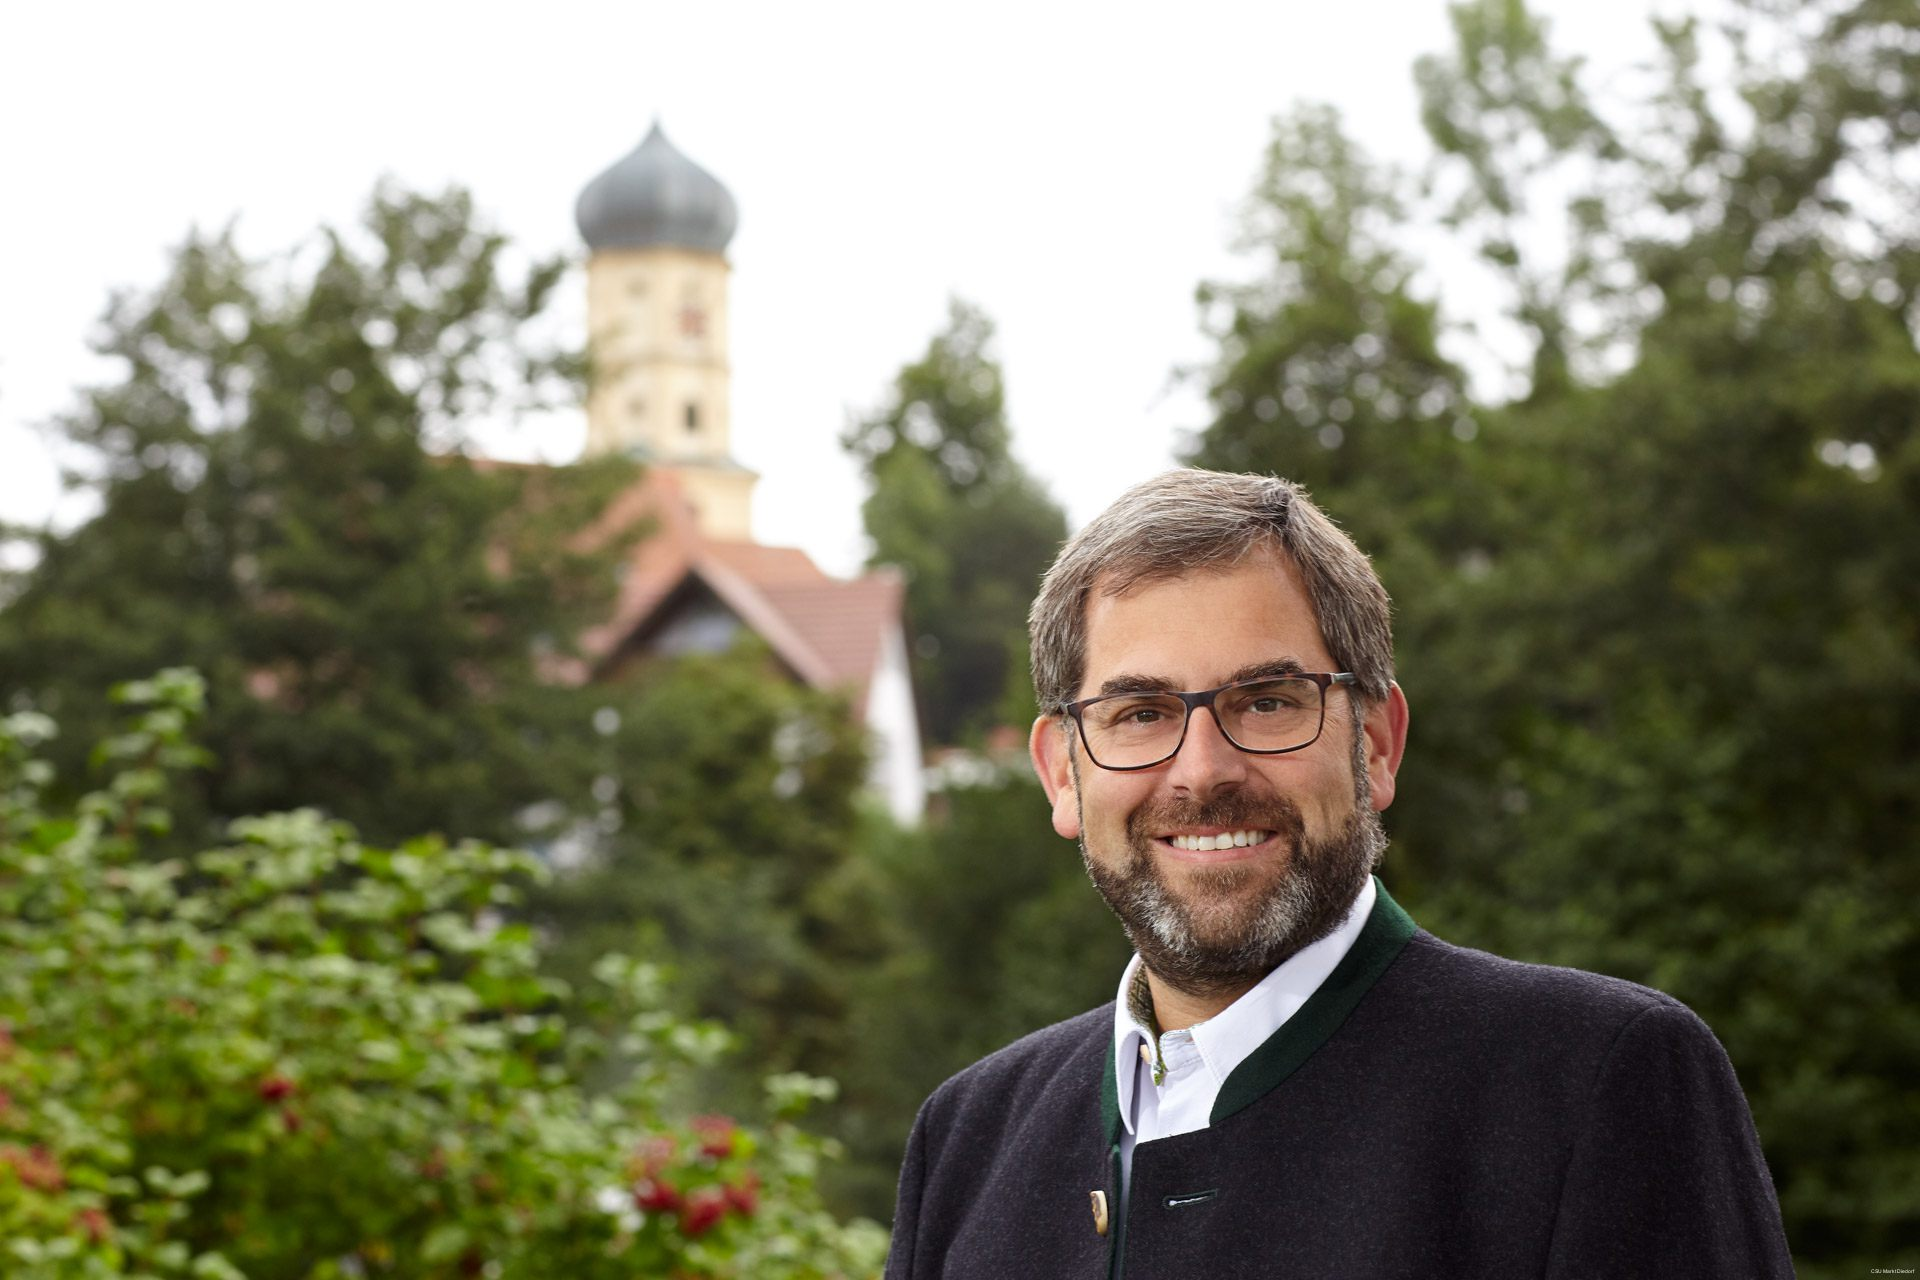 Thomas Rittel